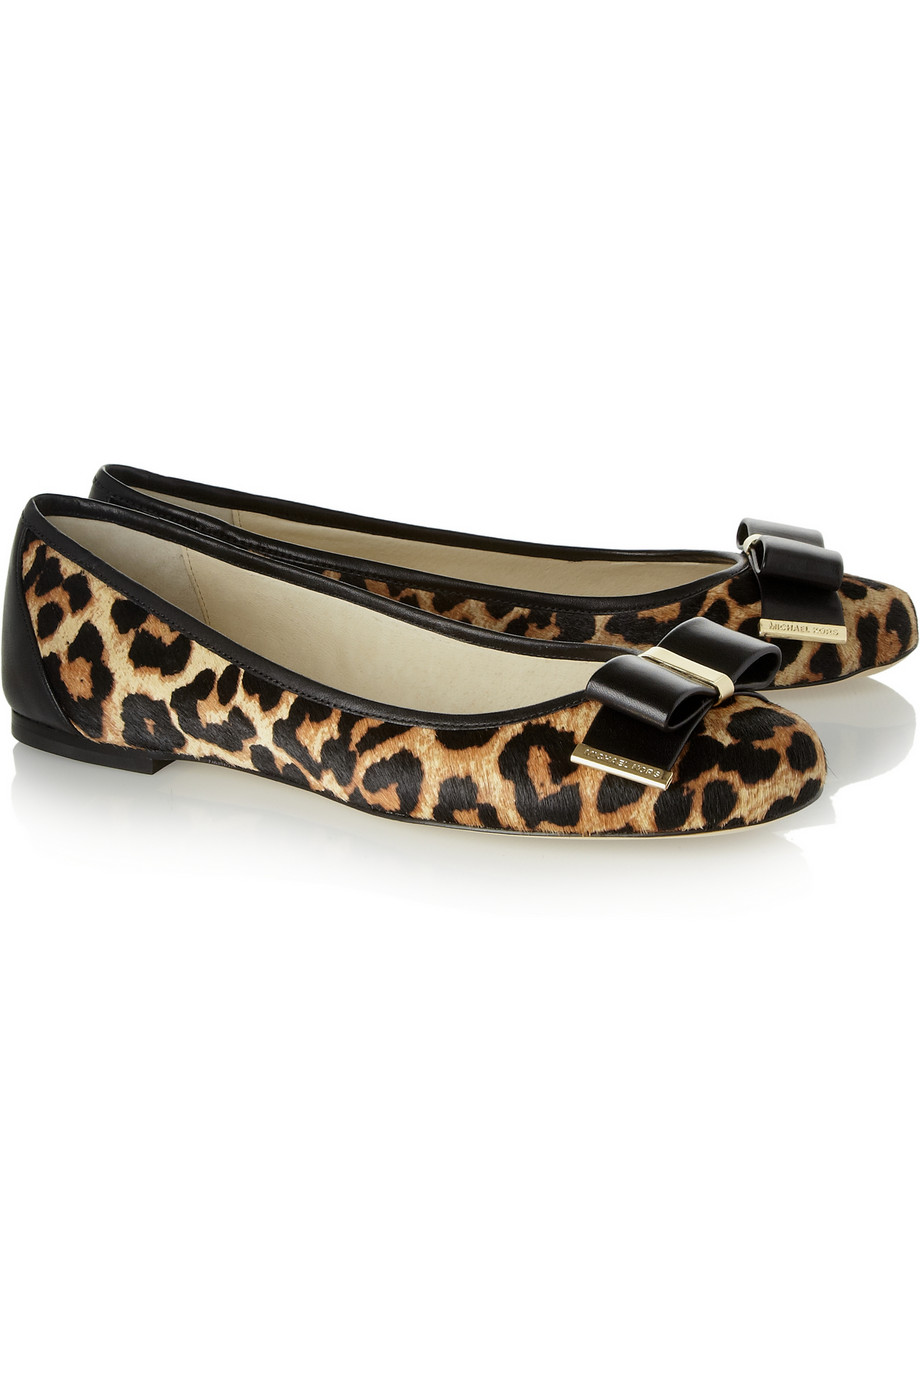 MICHAEL MICHAEL KORS Kiera Leopard-print Calf Hair Ballet Flats | Leopard Print Fall 2014